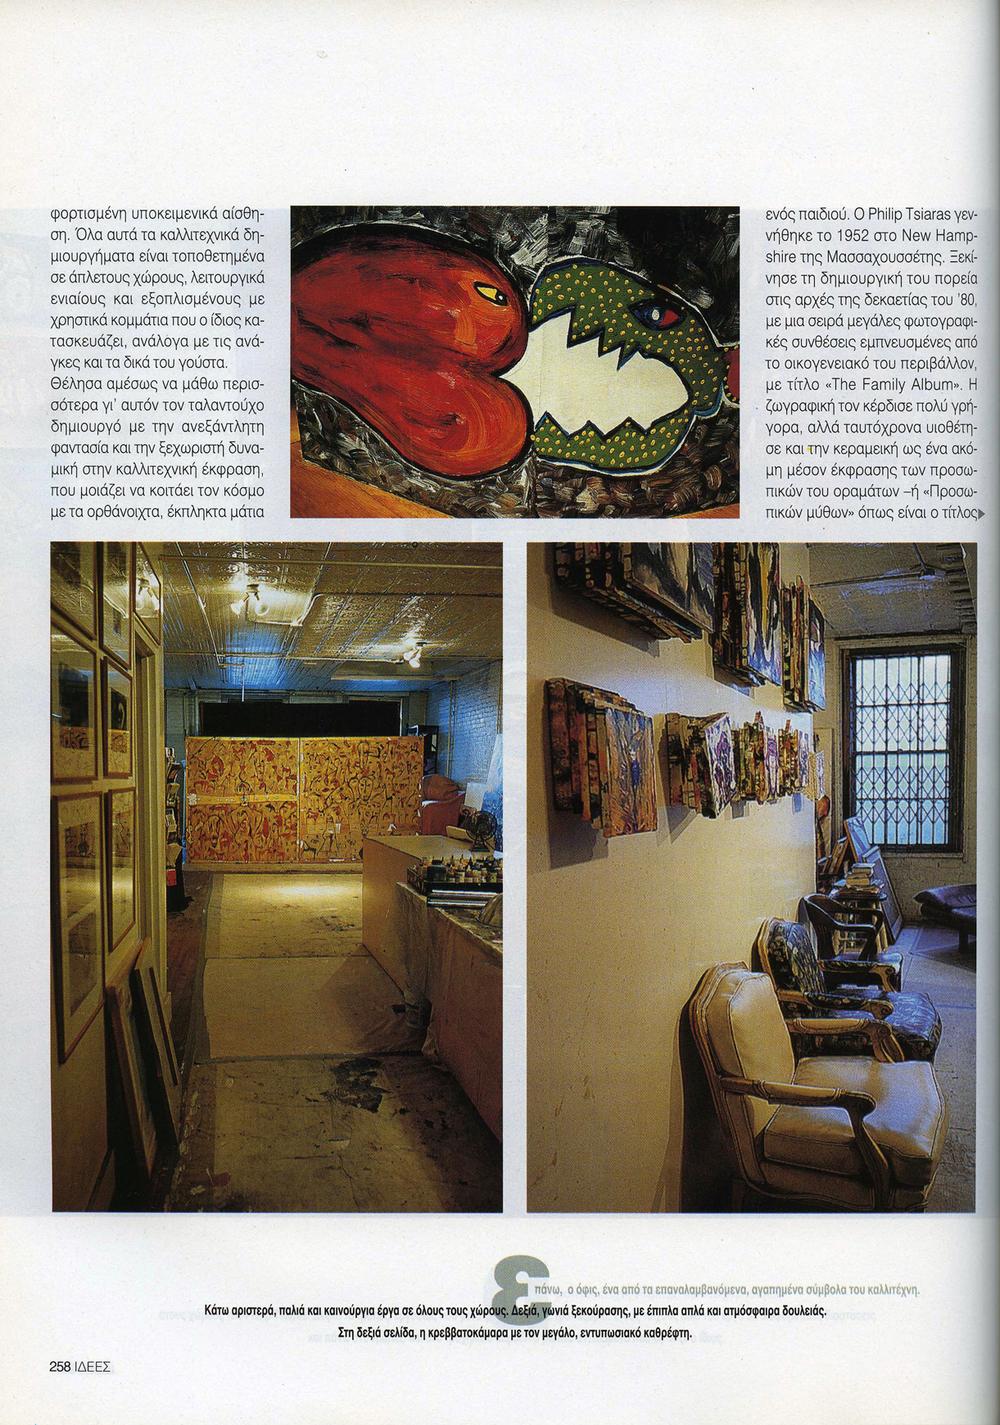 ideas-july-99-pg5.jpg